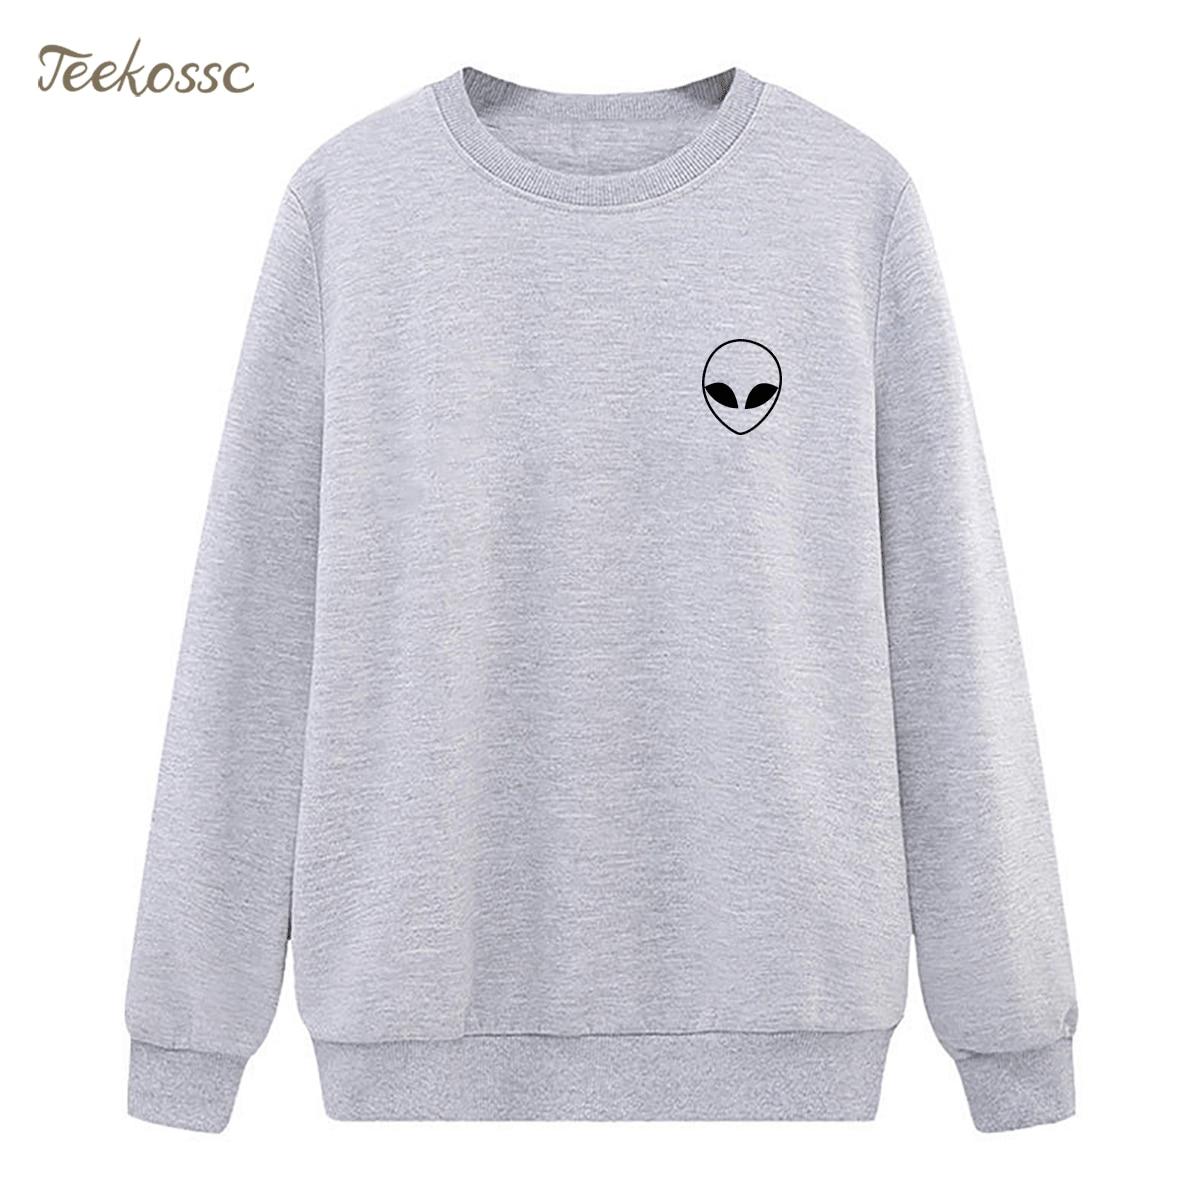 Alien Pocket Sweatshirts Womens Print Hoodie 2018 New Winter Autumn Lady Pullover Loose Fleece Warm Hipster Casual Streetwear